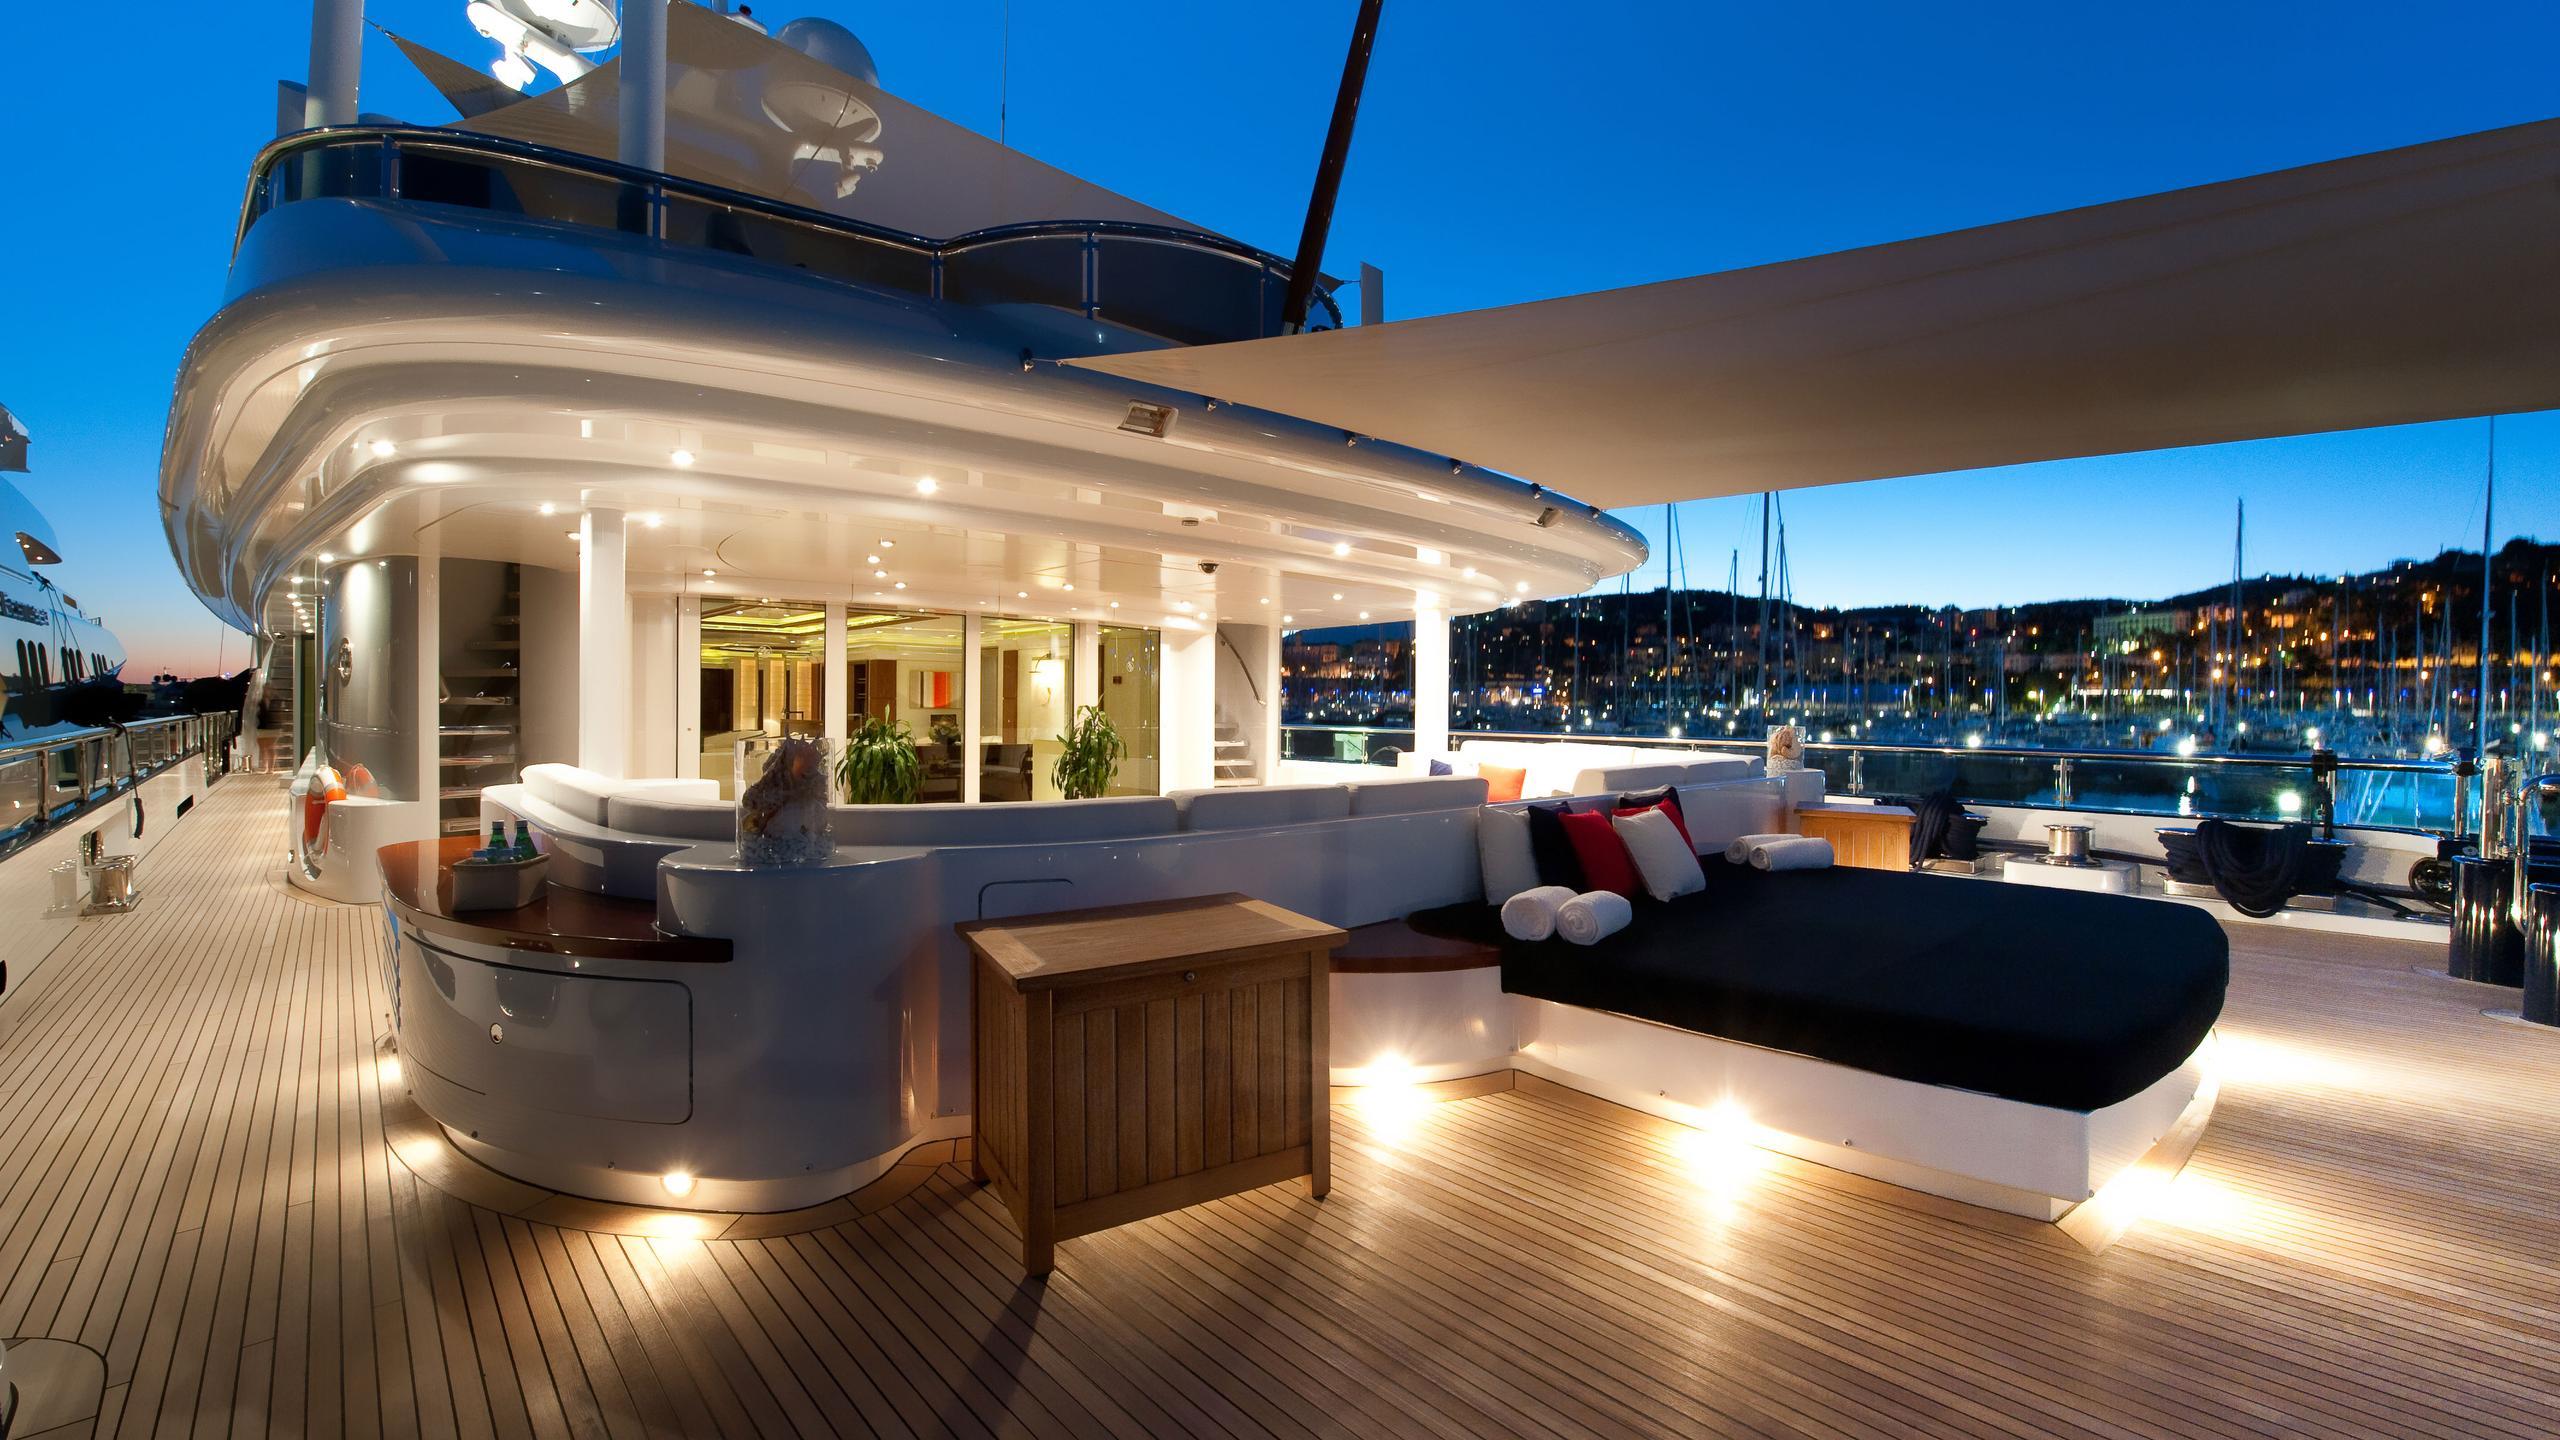 triple-seven-motor-yacht-nobiskrug-2006-68m-deck-by-night